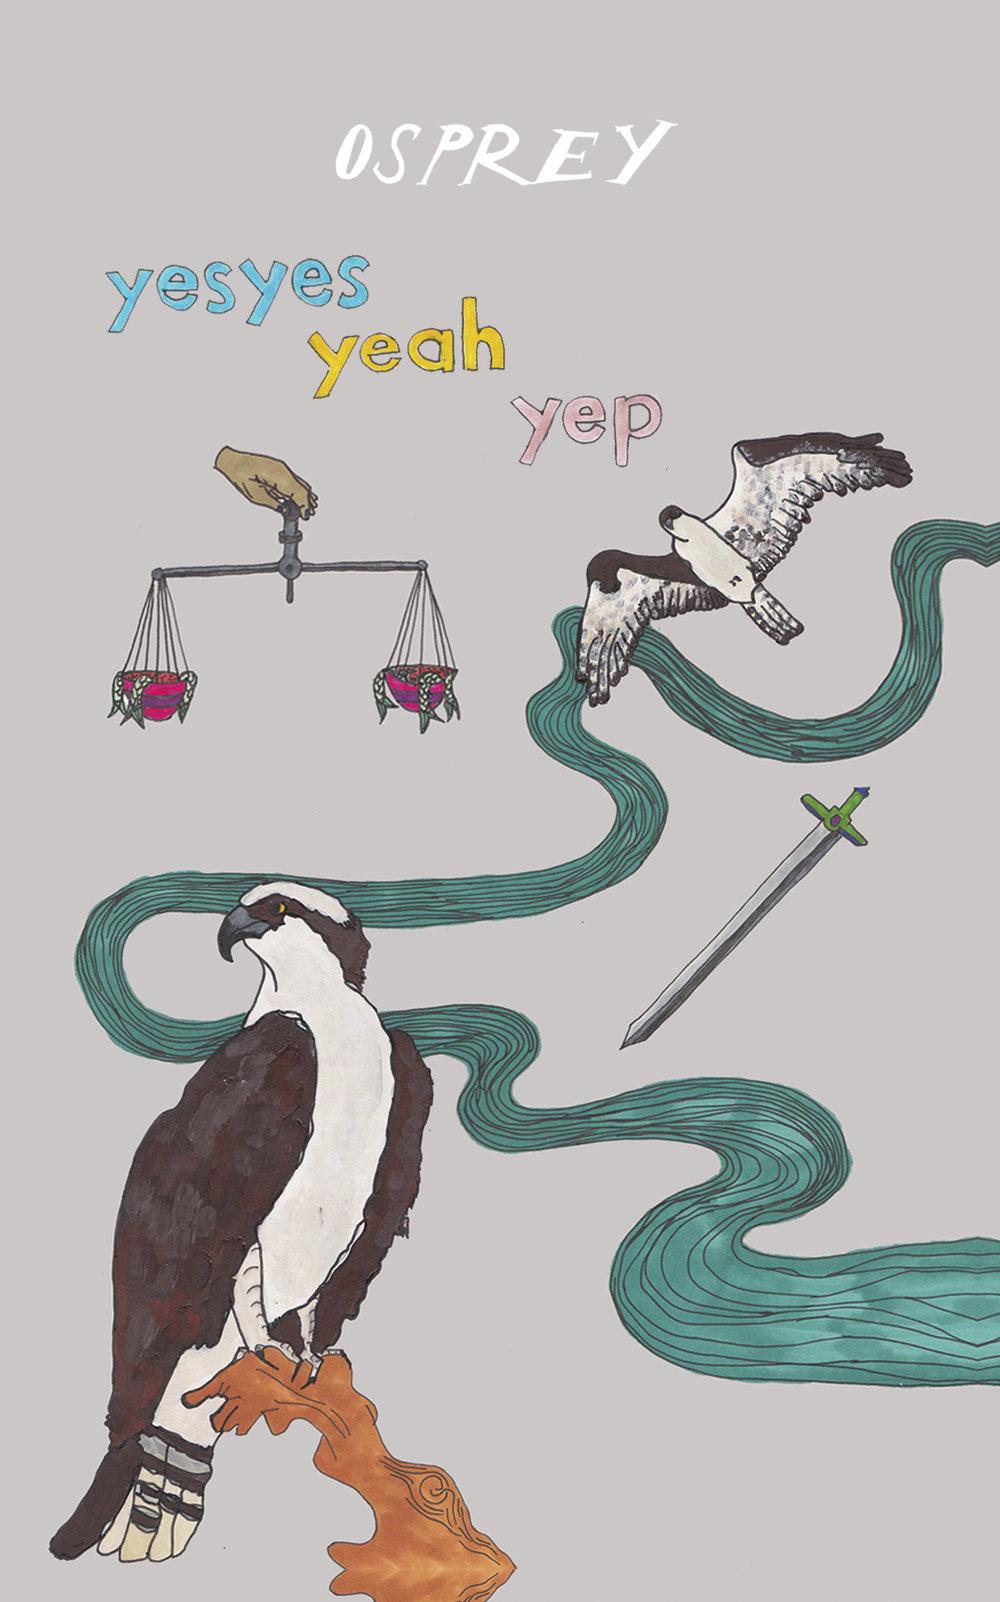 11 osprey justice.jpg